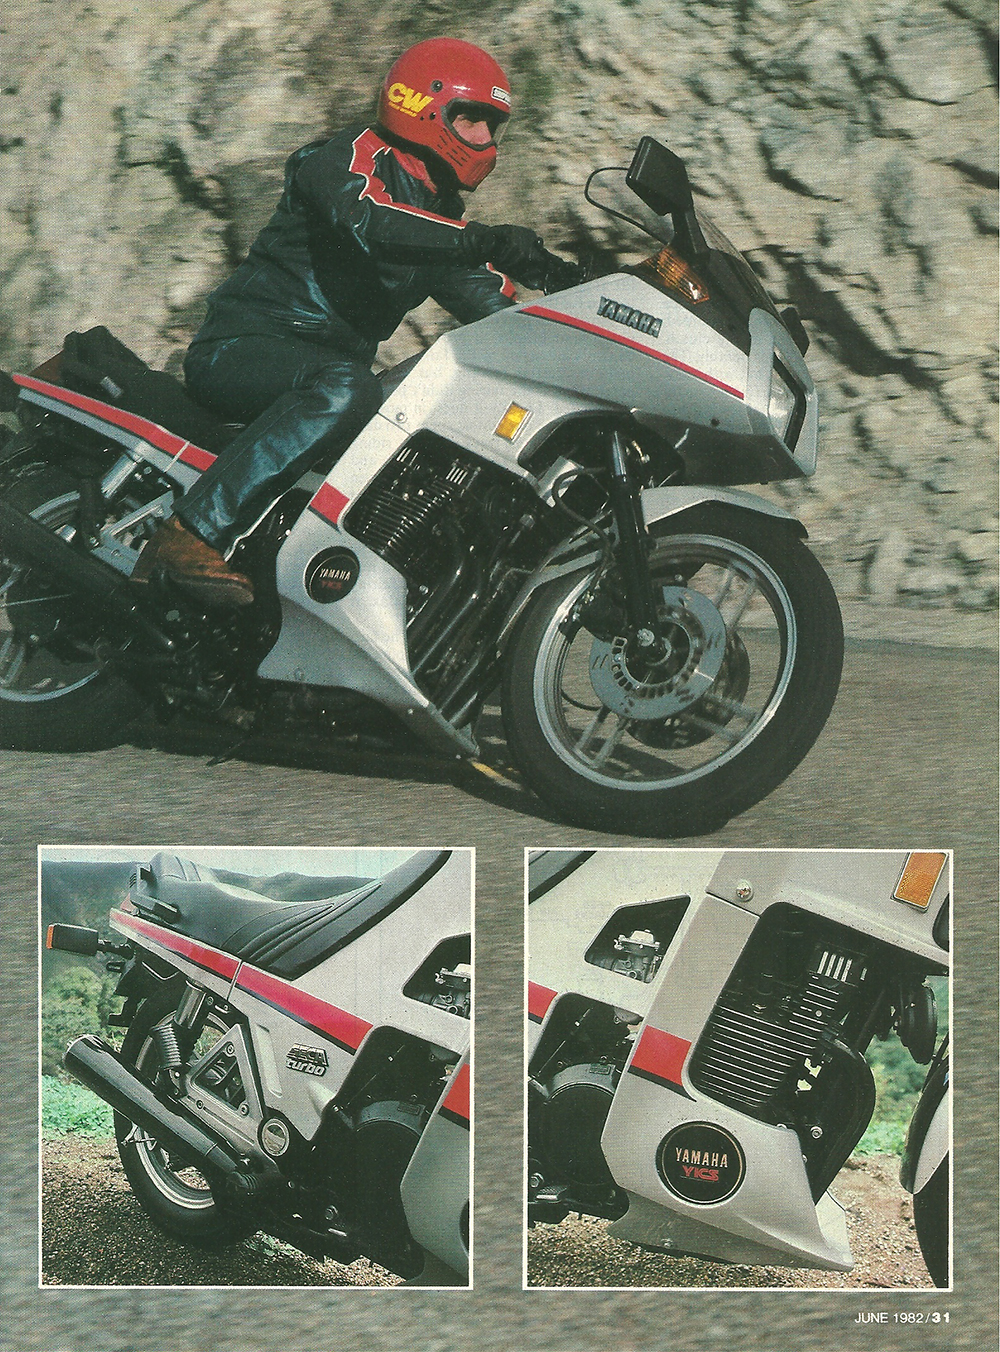 1982 Yamaha Turbo Seca 650 road test 04.jpg